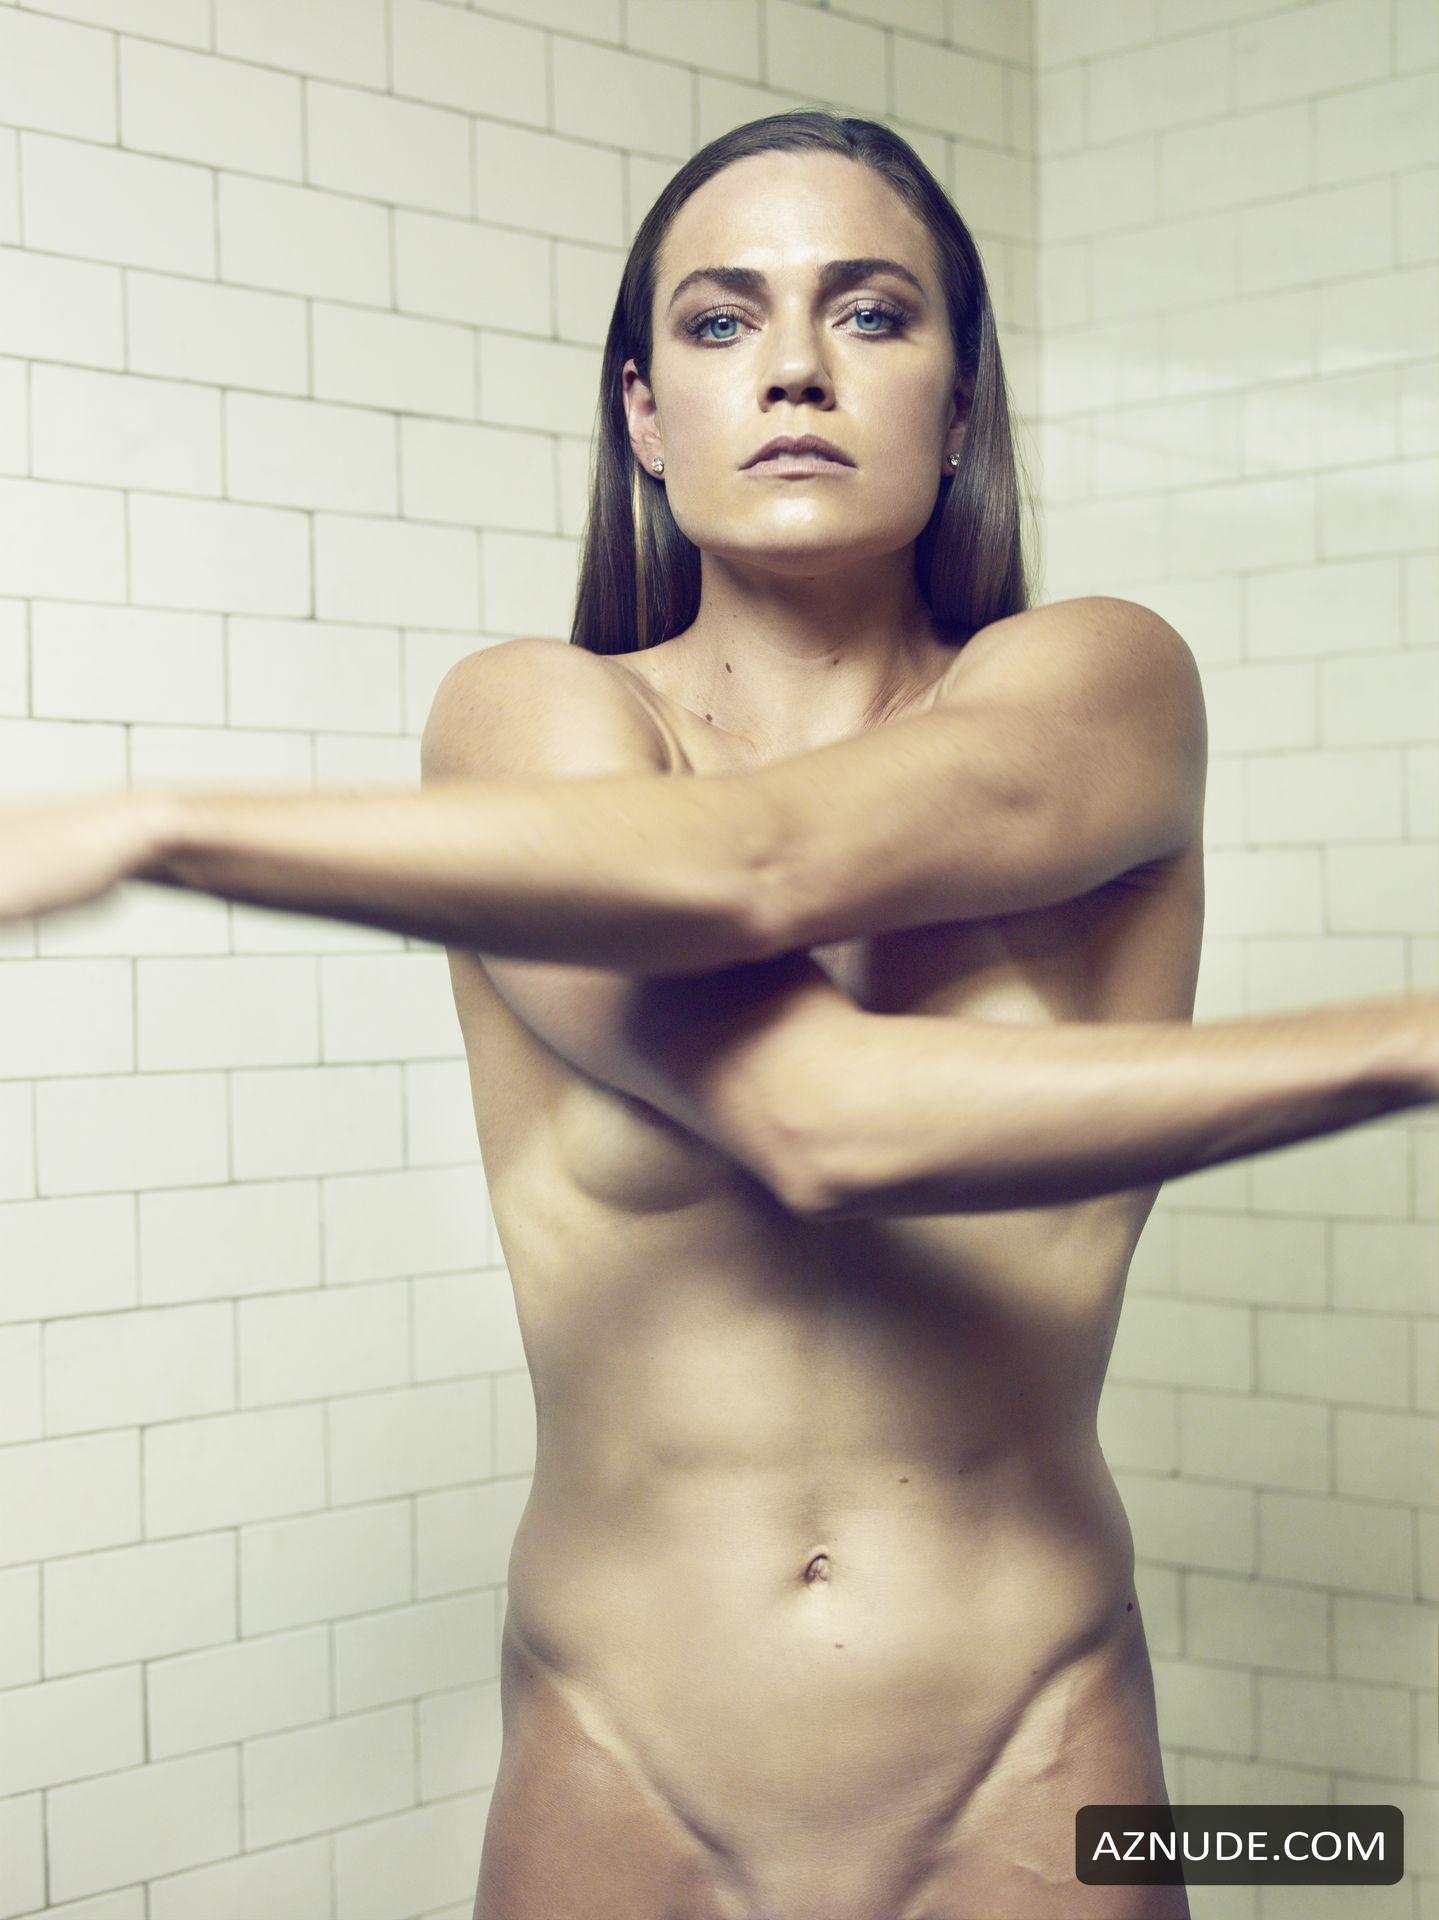 Natalie Hot Nude